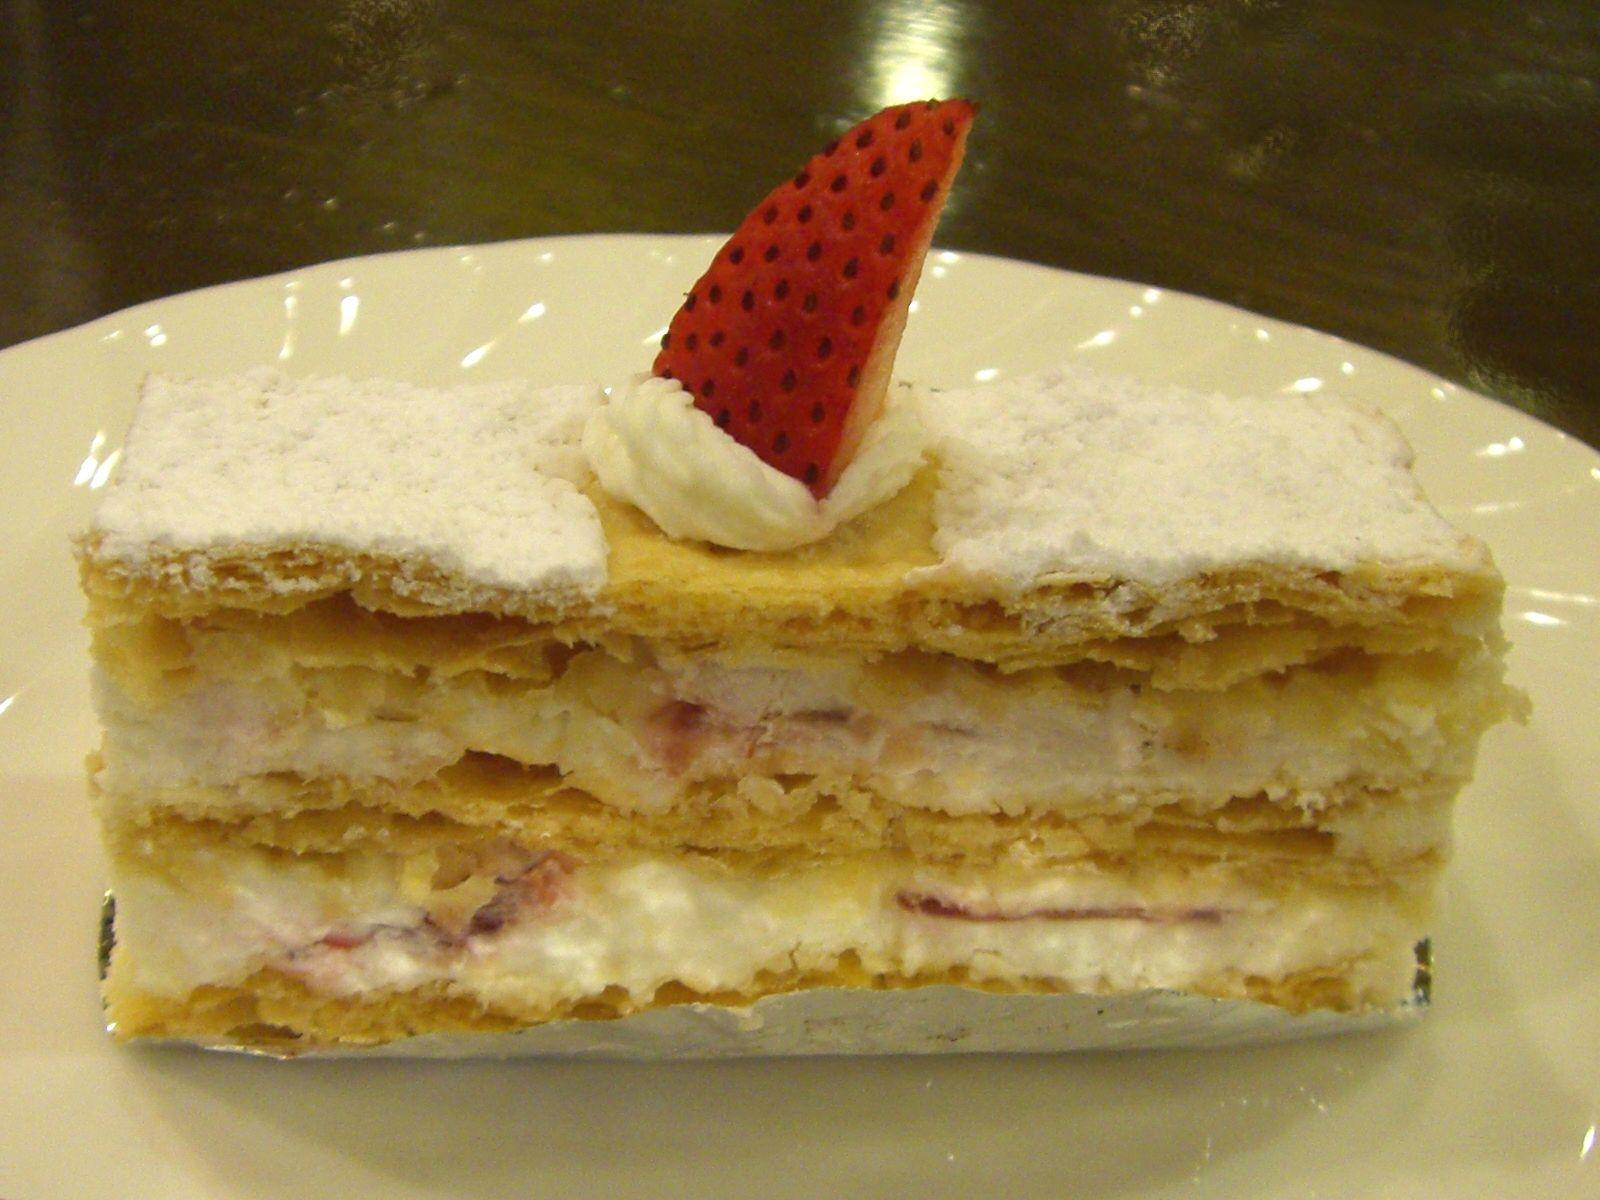 French Dessert Names Description Millefeuille 01.jpg